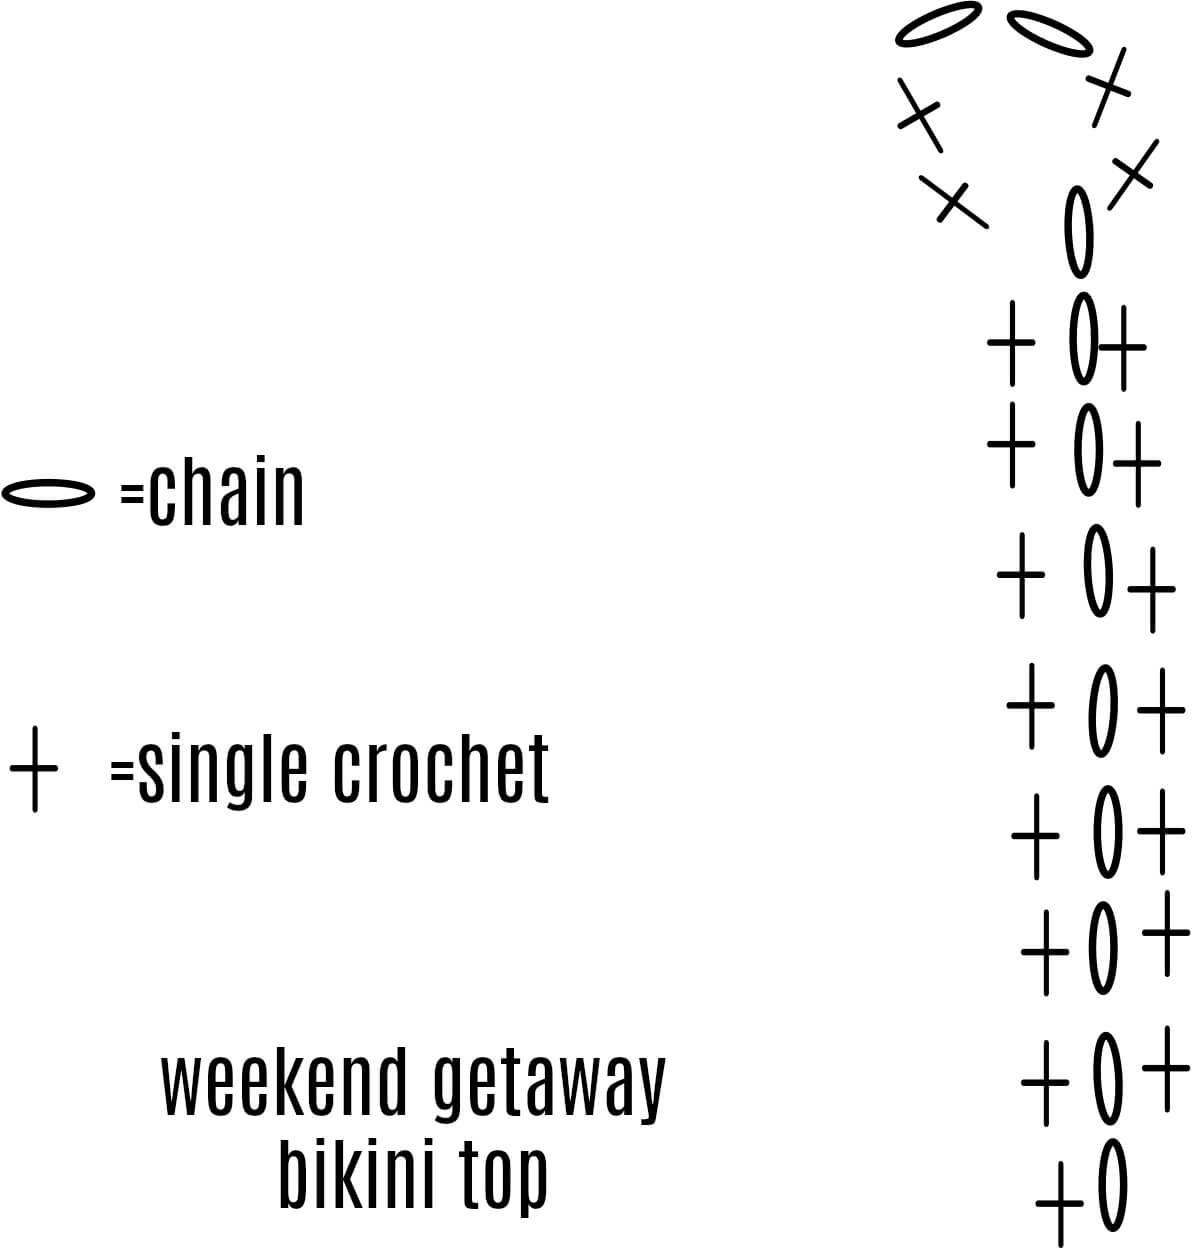 The weekend getaway bikini top free crochet pattern